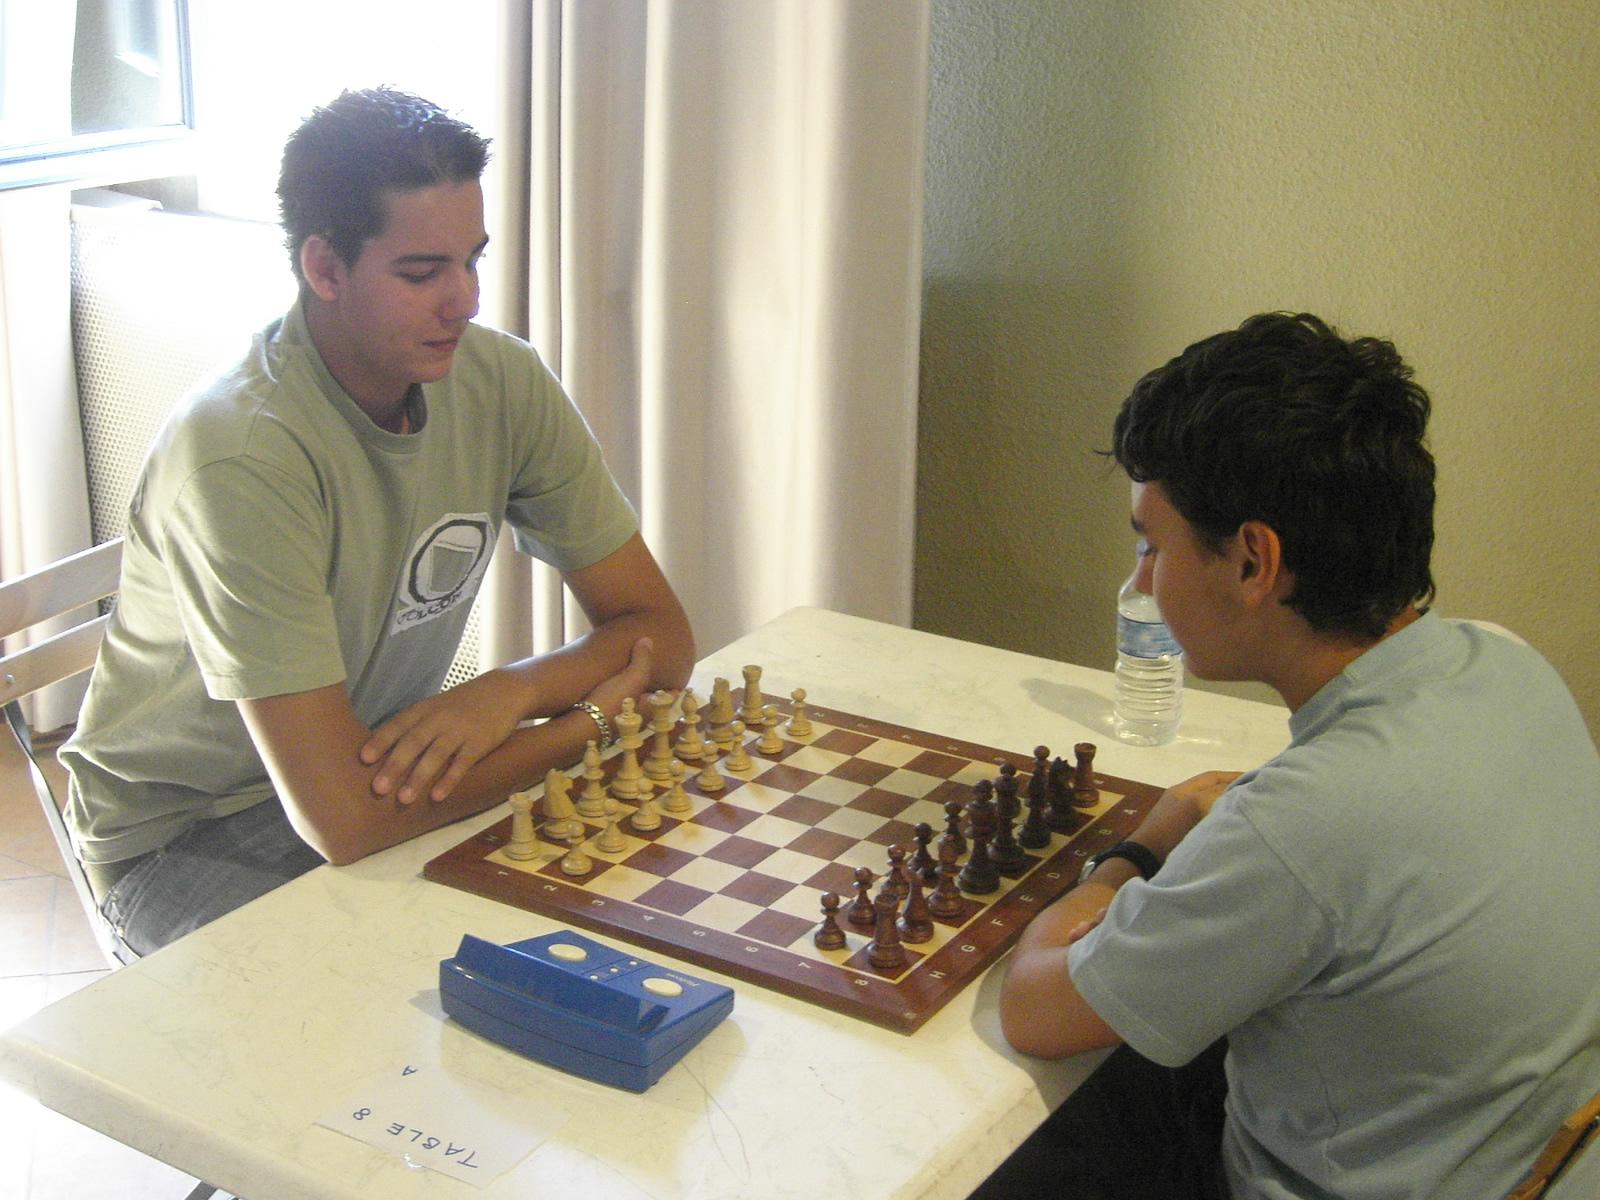 Grand Prix Arcois 2007 (50) Jordi Urrutia vs Pierre Villegas